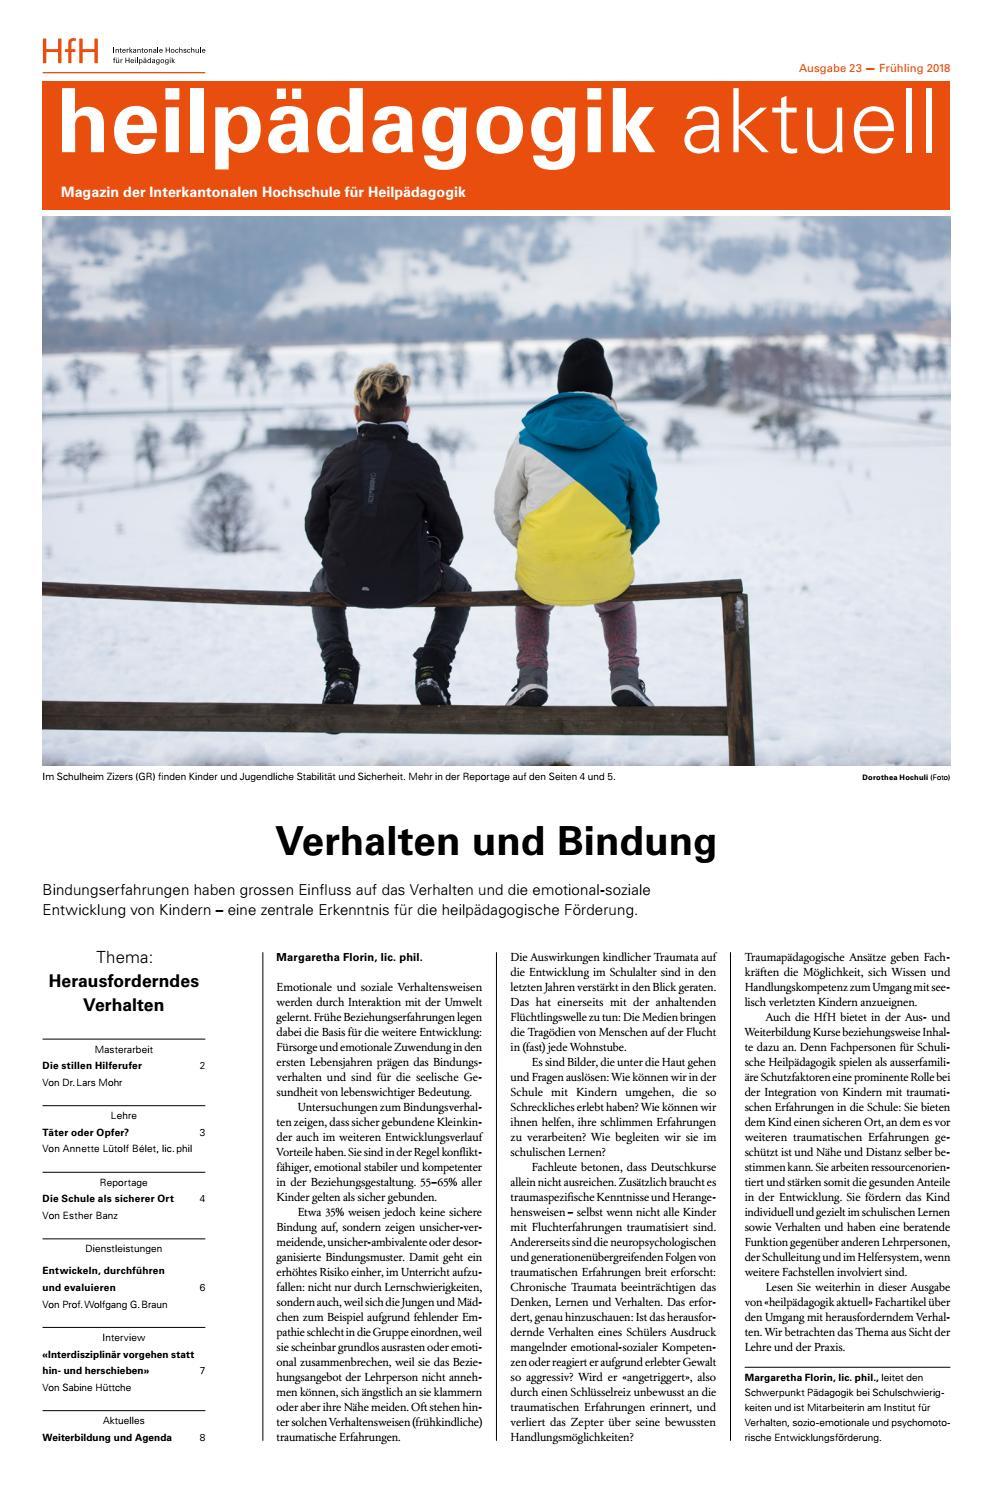 heilpädagogik aktuell», Nummer 23, Frühjahr 2018 by Interkantonale ...